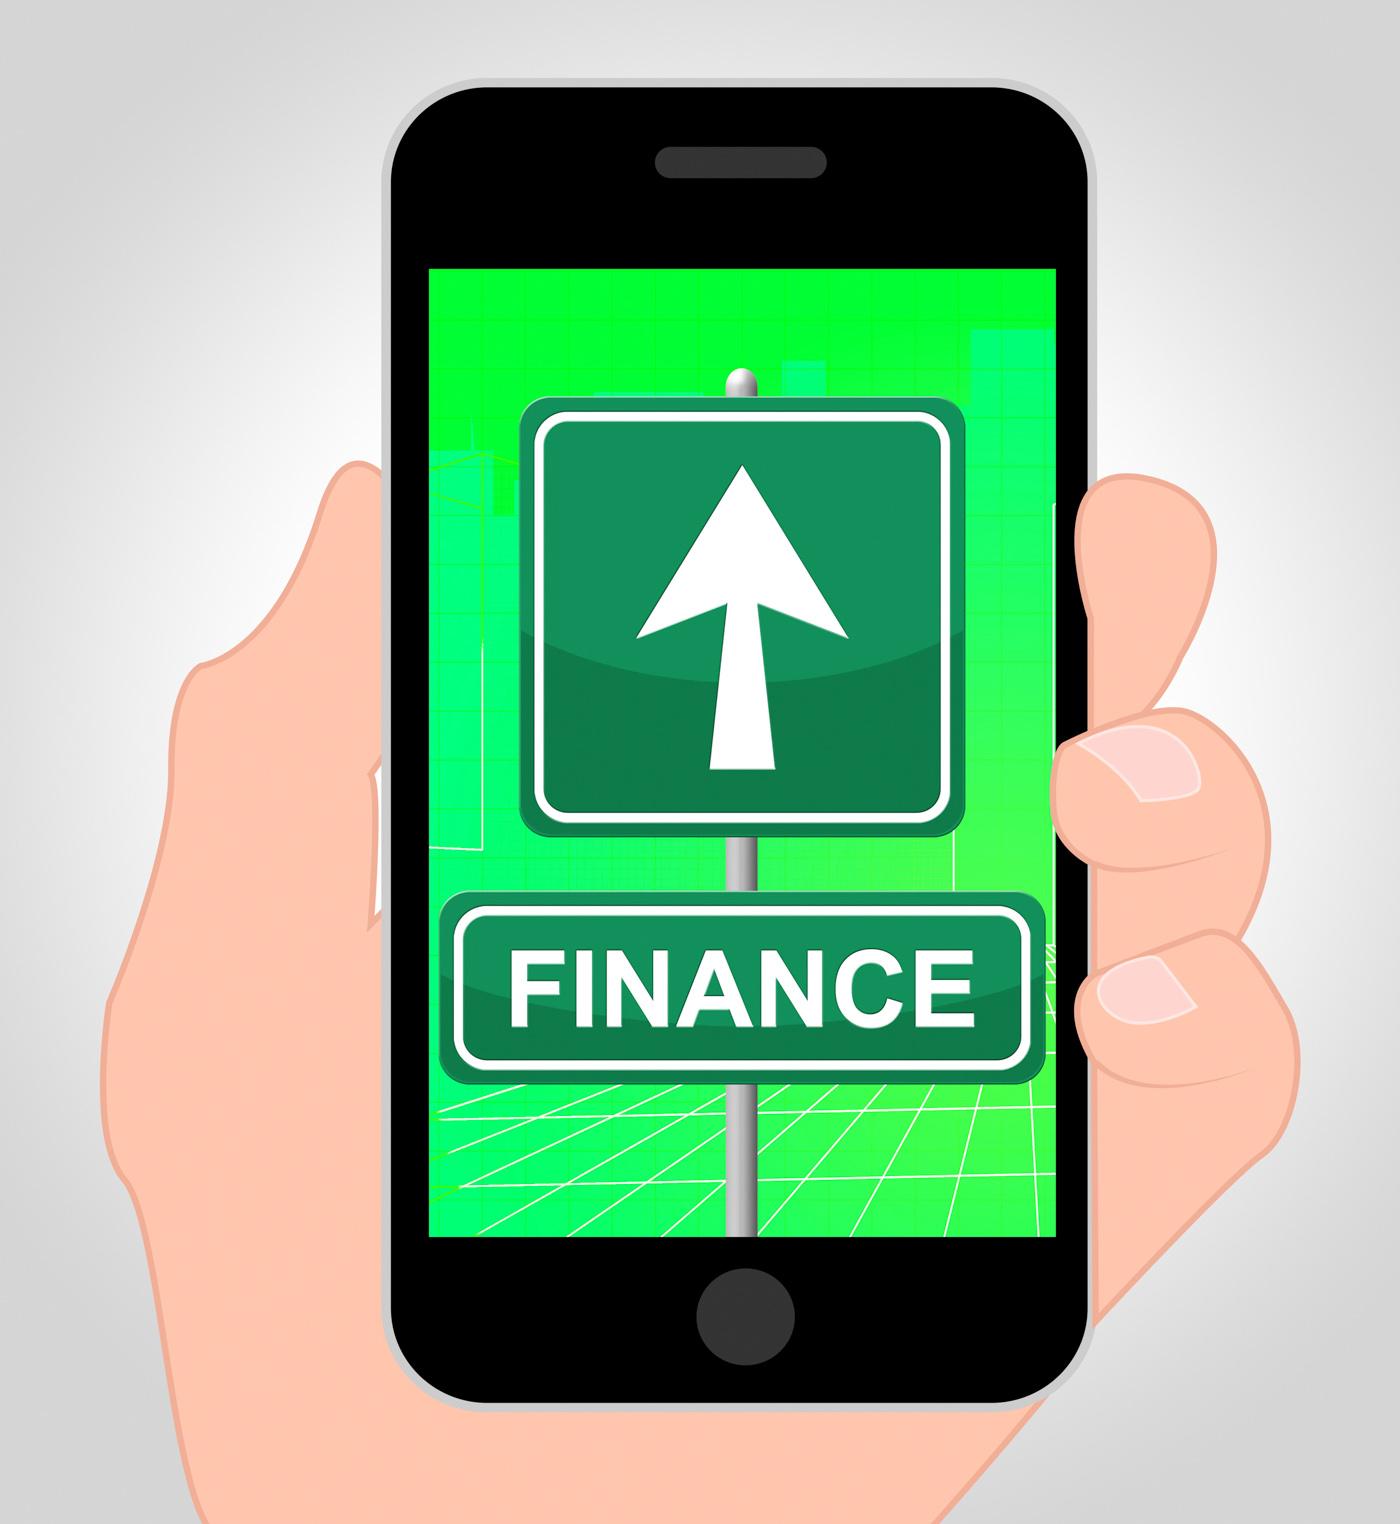 Finance folder represents financial investment 3d illustration photo